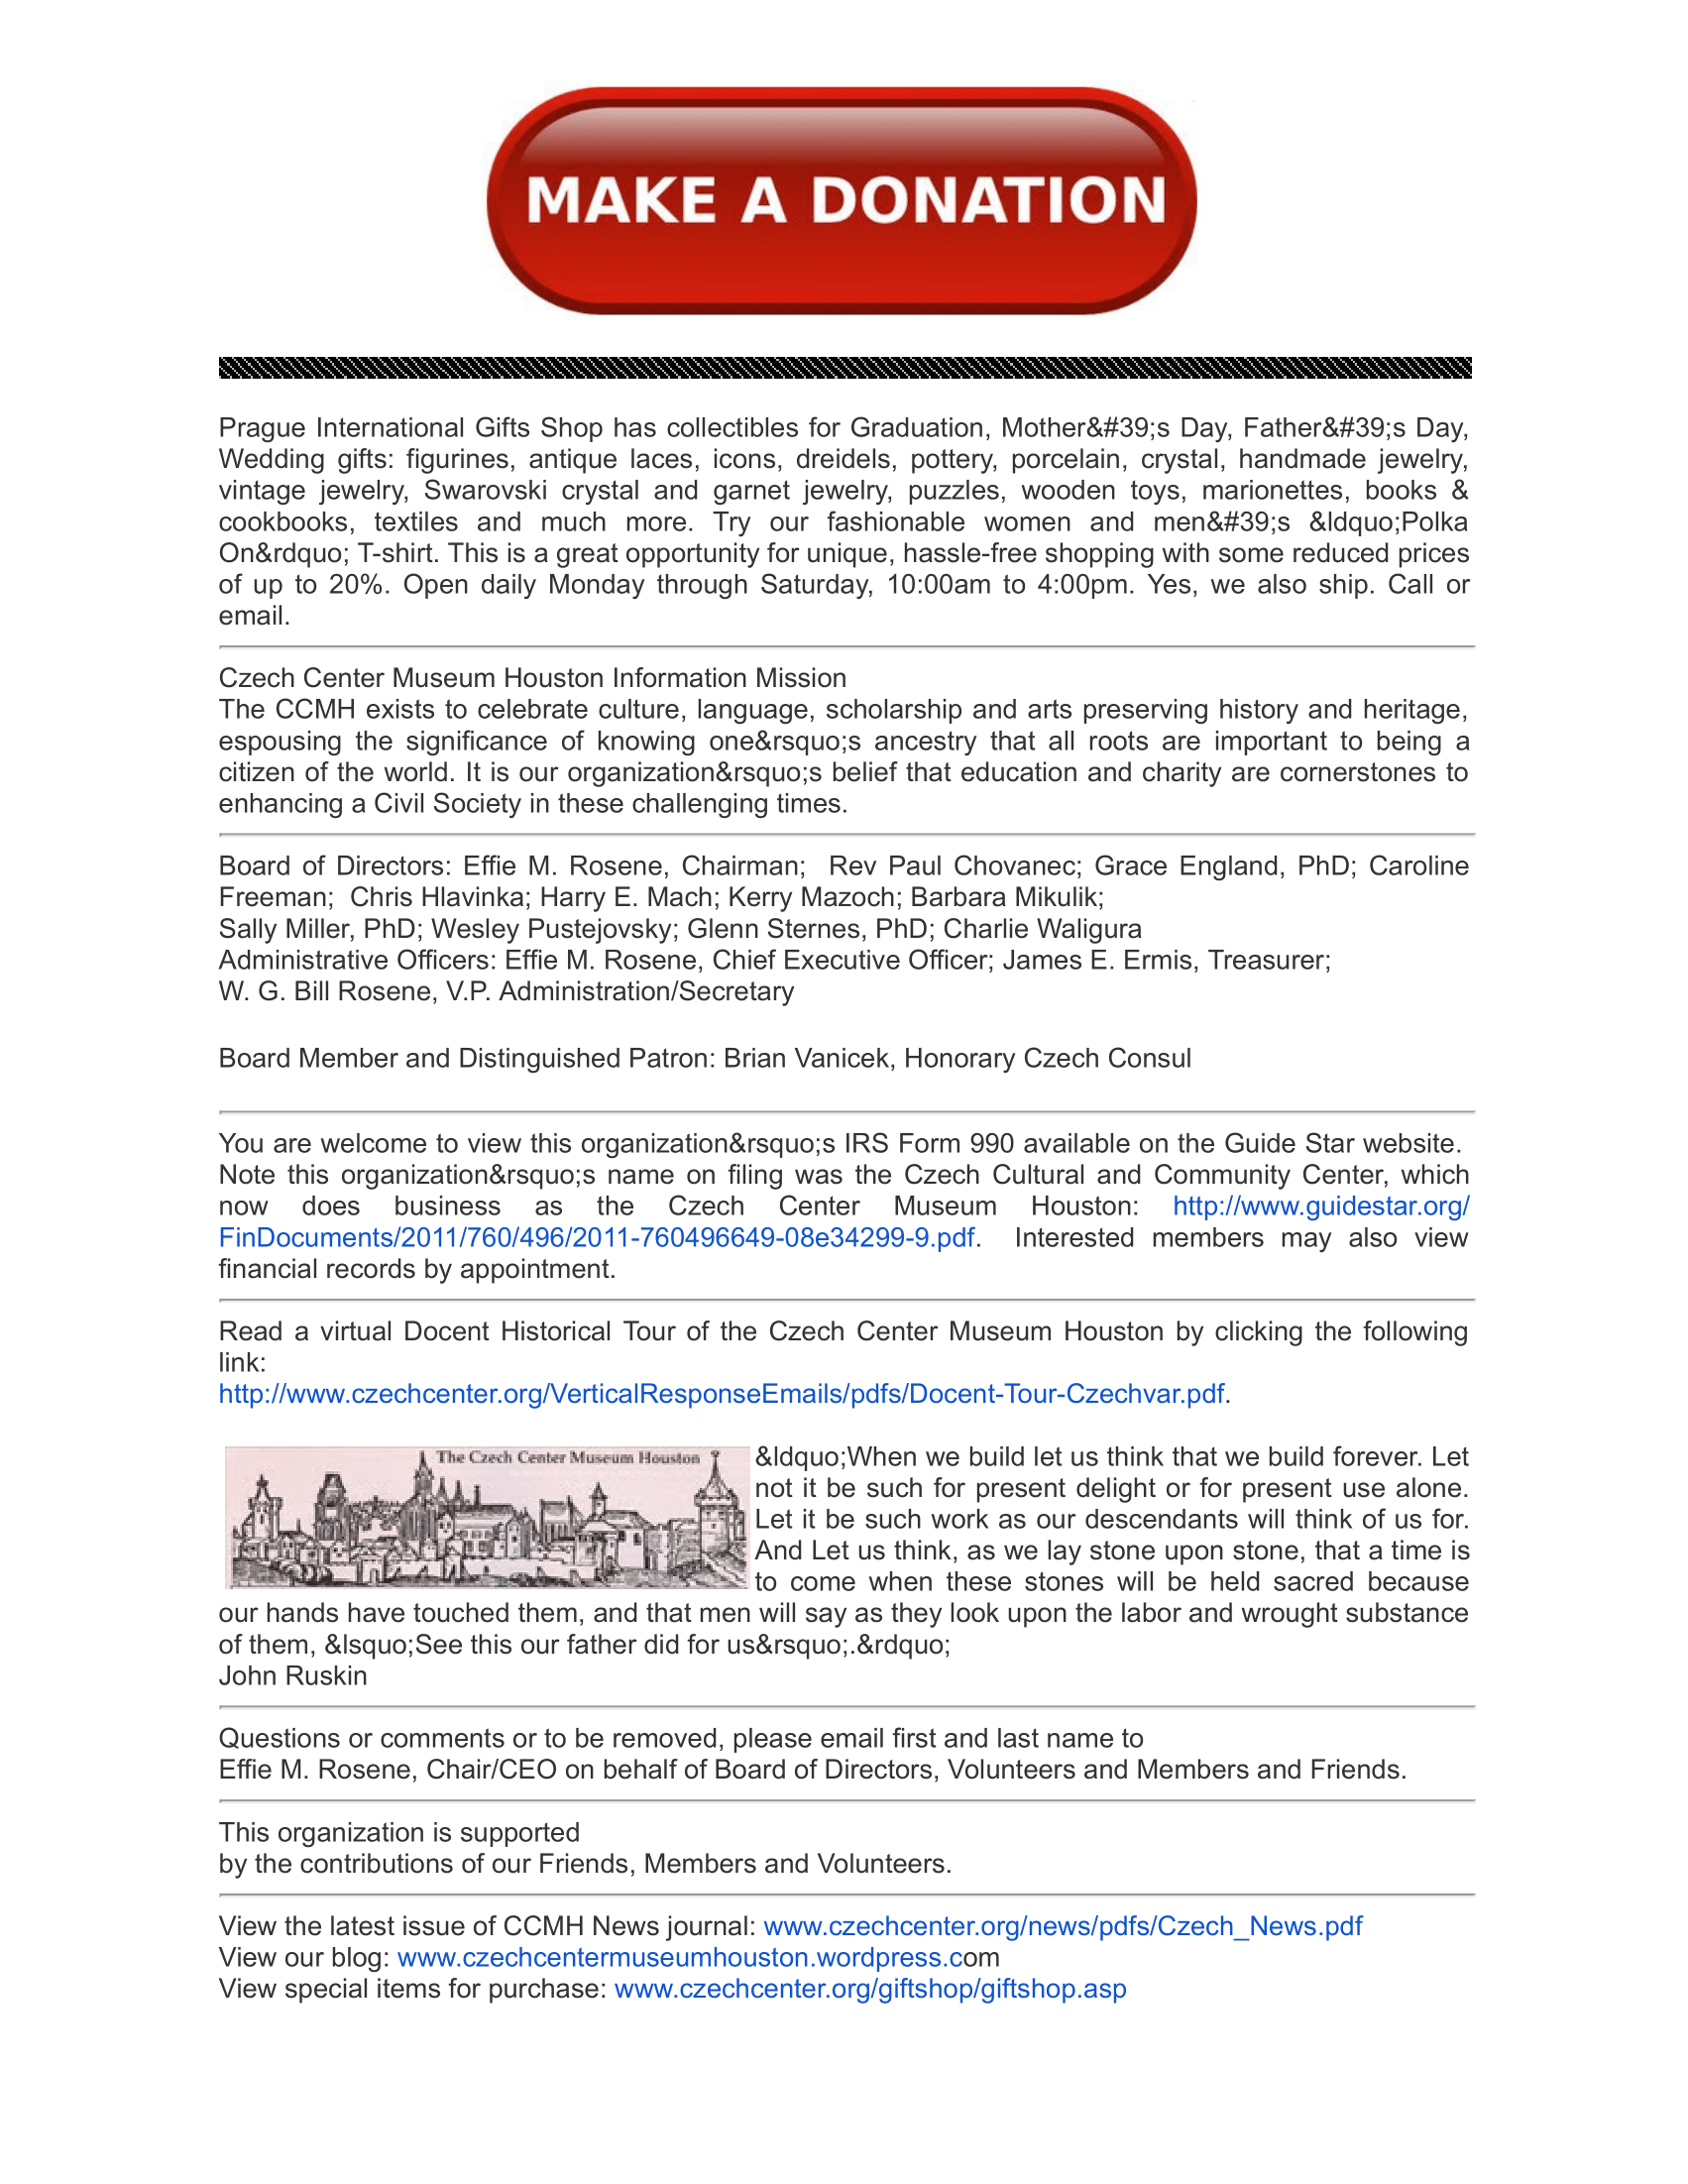 Czech Center Museum Houston Mail - CCMH august-september Newsletter-8.png